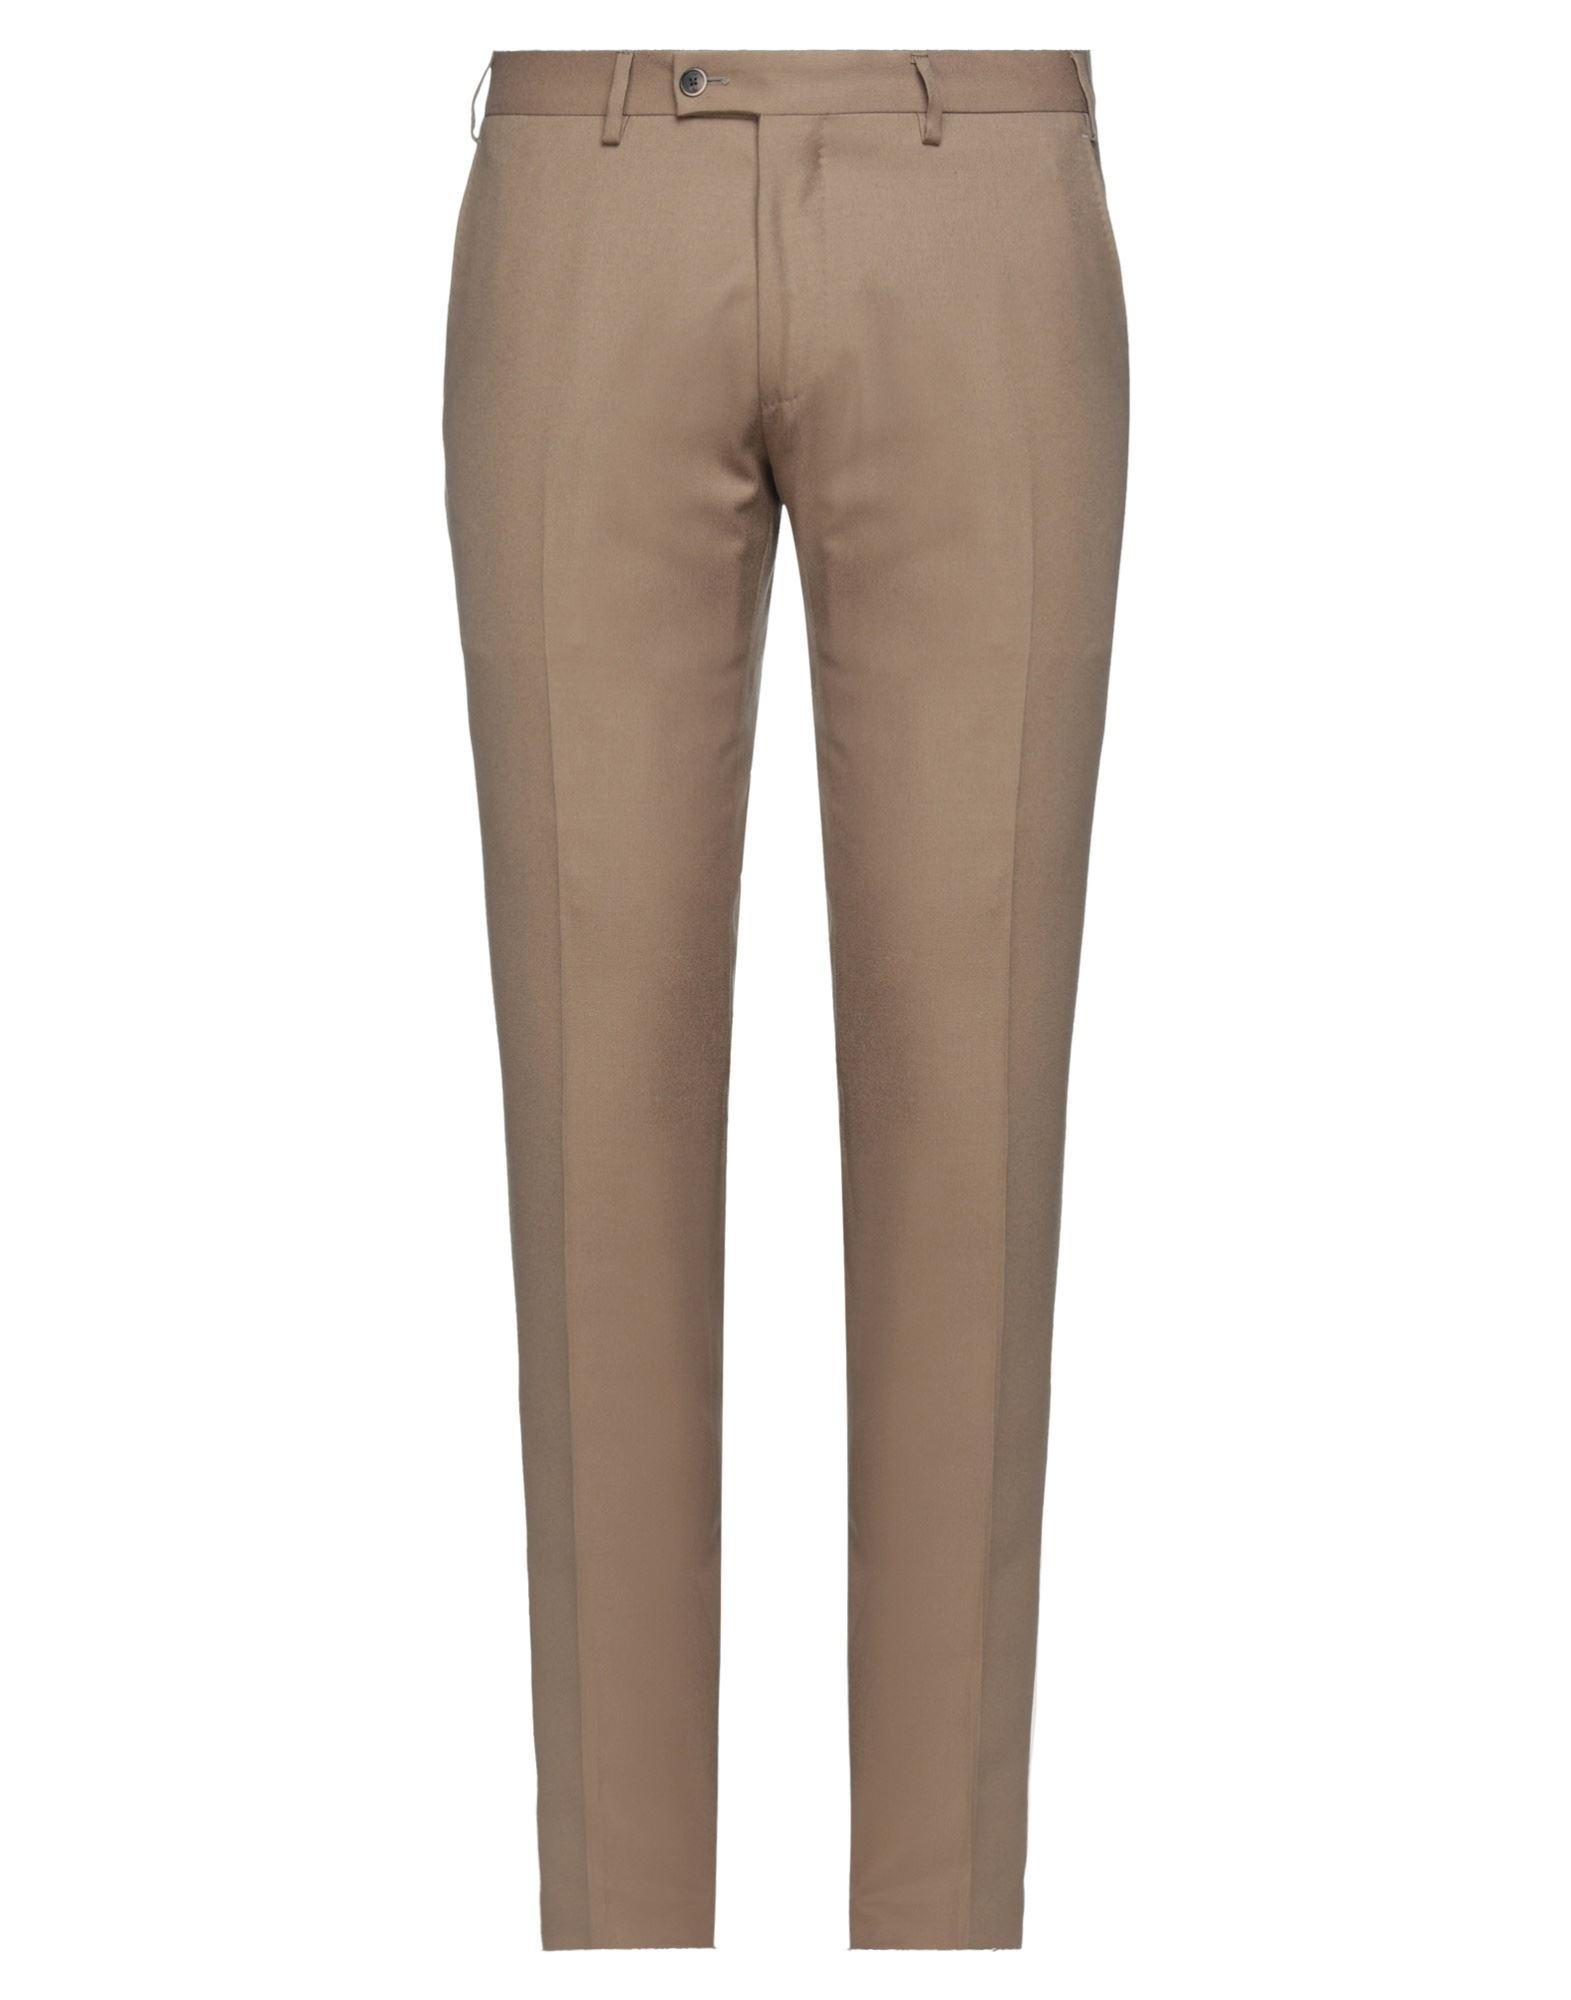 Фото - SARTORIA LATORRE Повседневные брюки sartoria toscana повседневные брюки